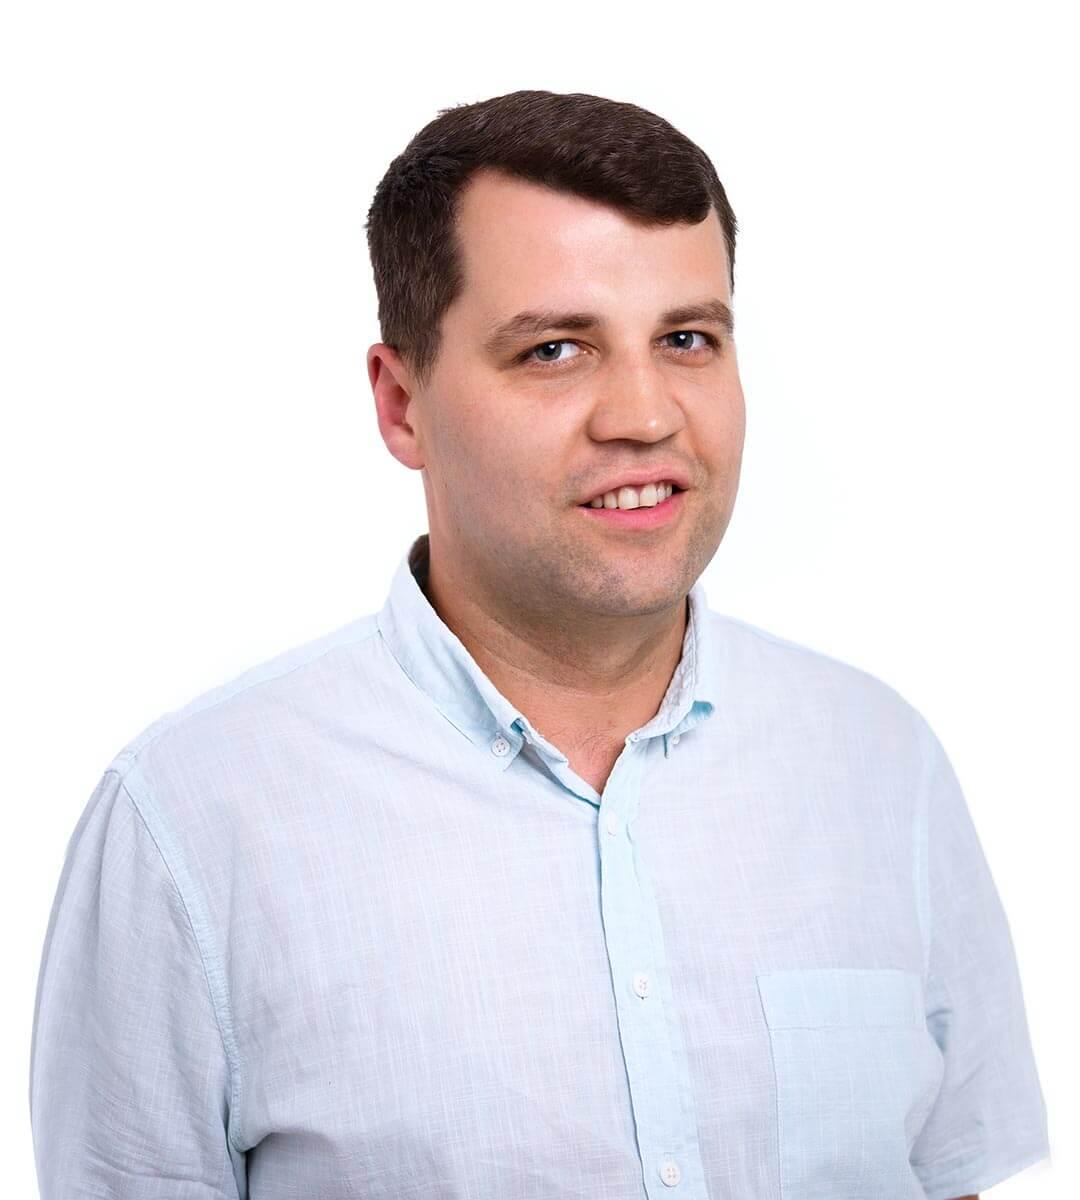 Piotr Baran